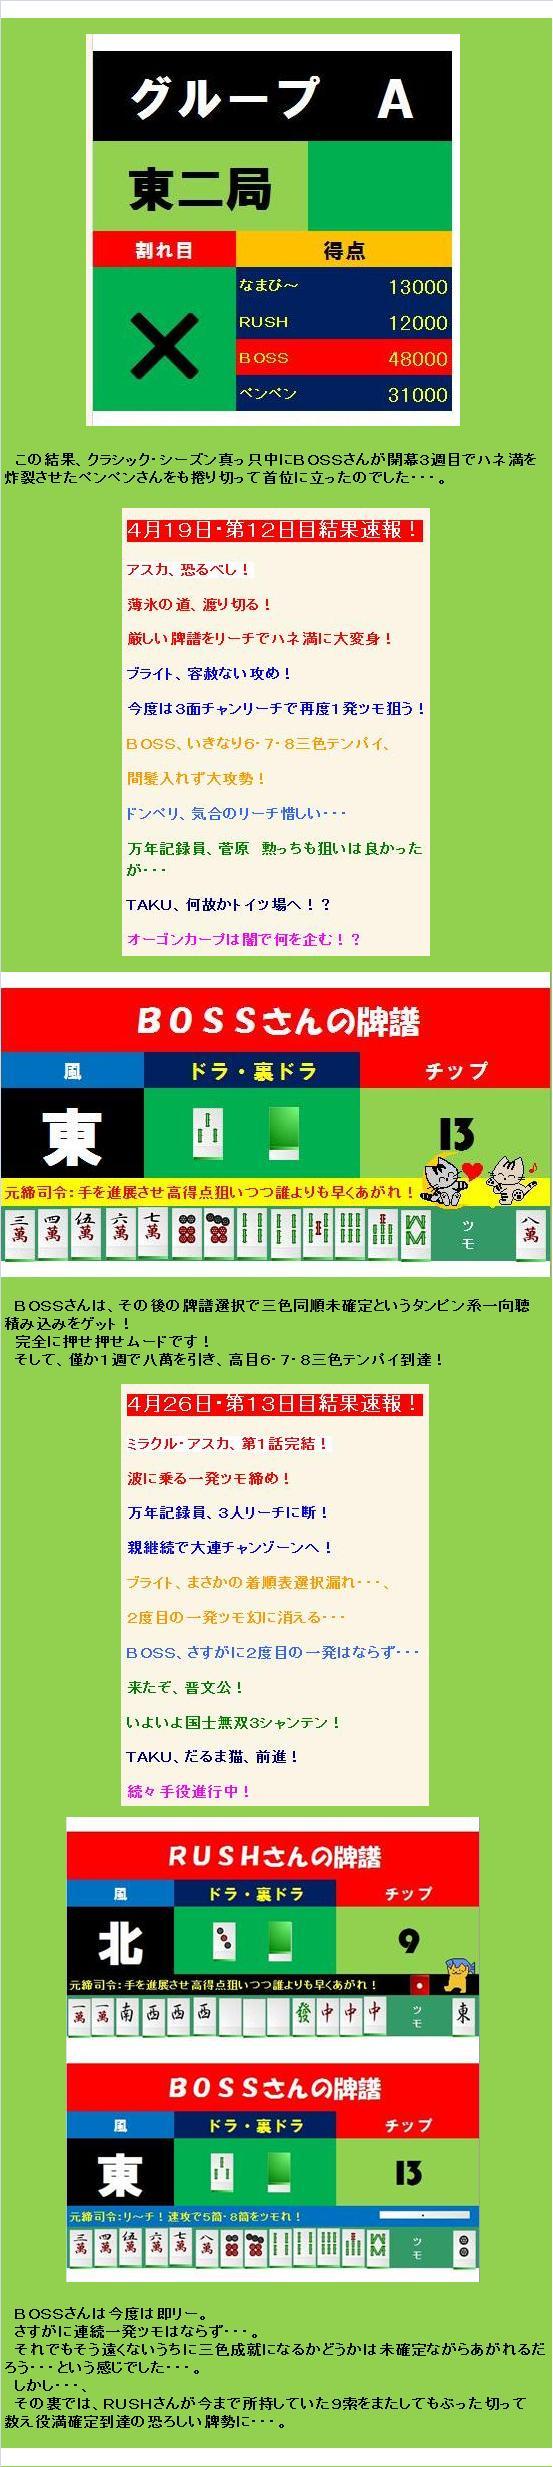 20100226・A組回顧07.jpg